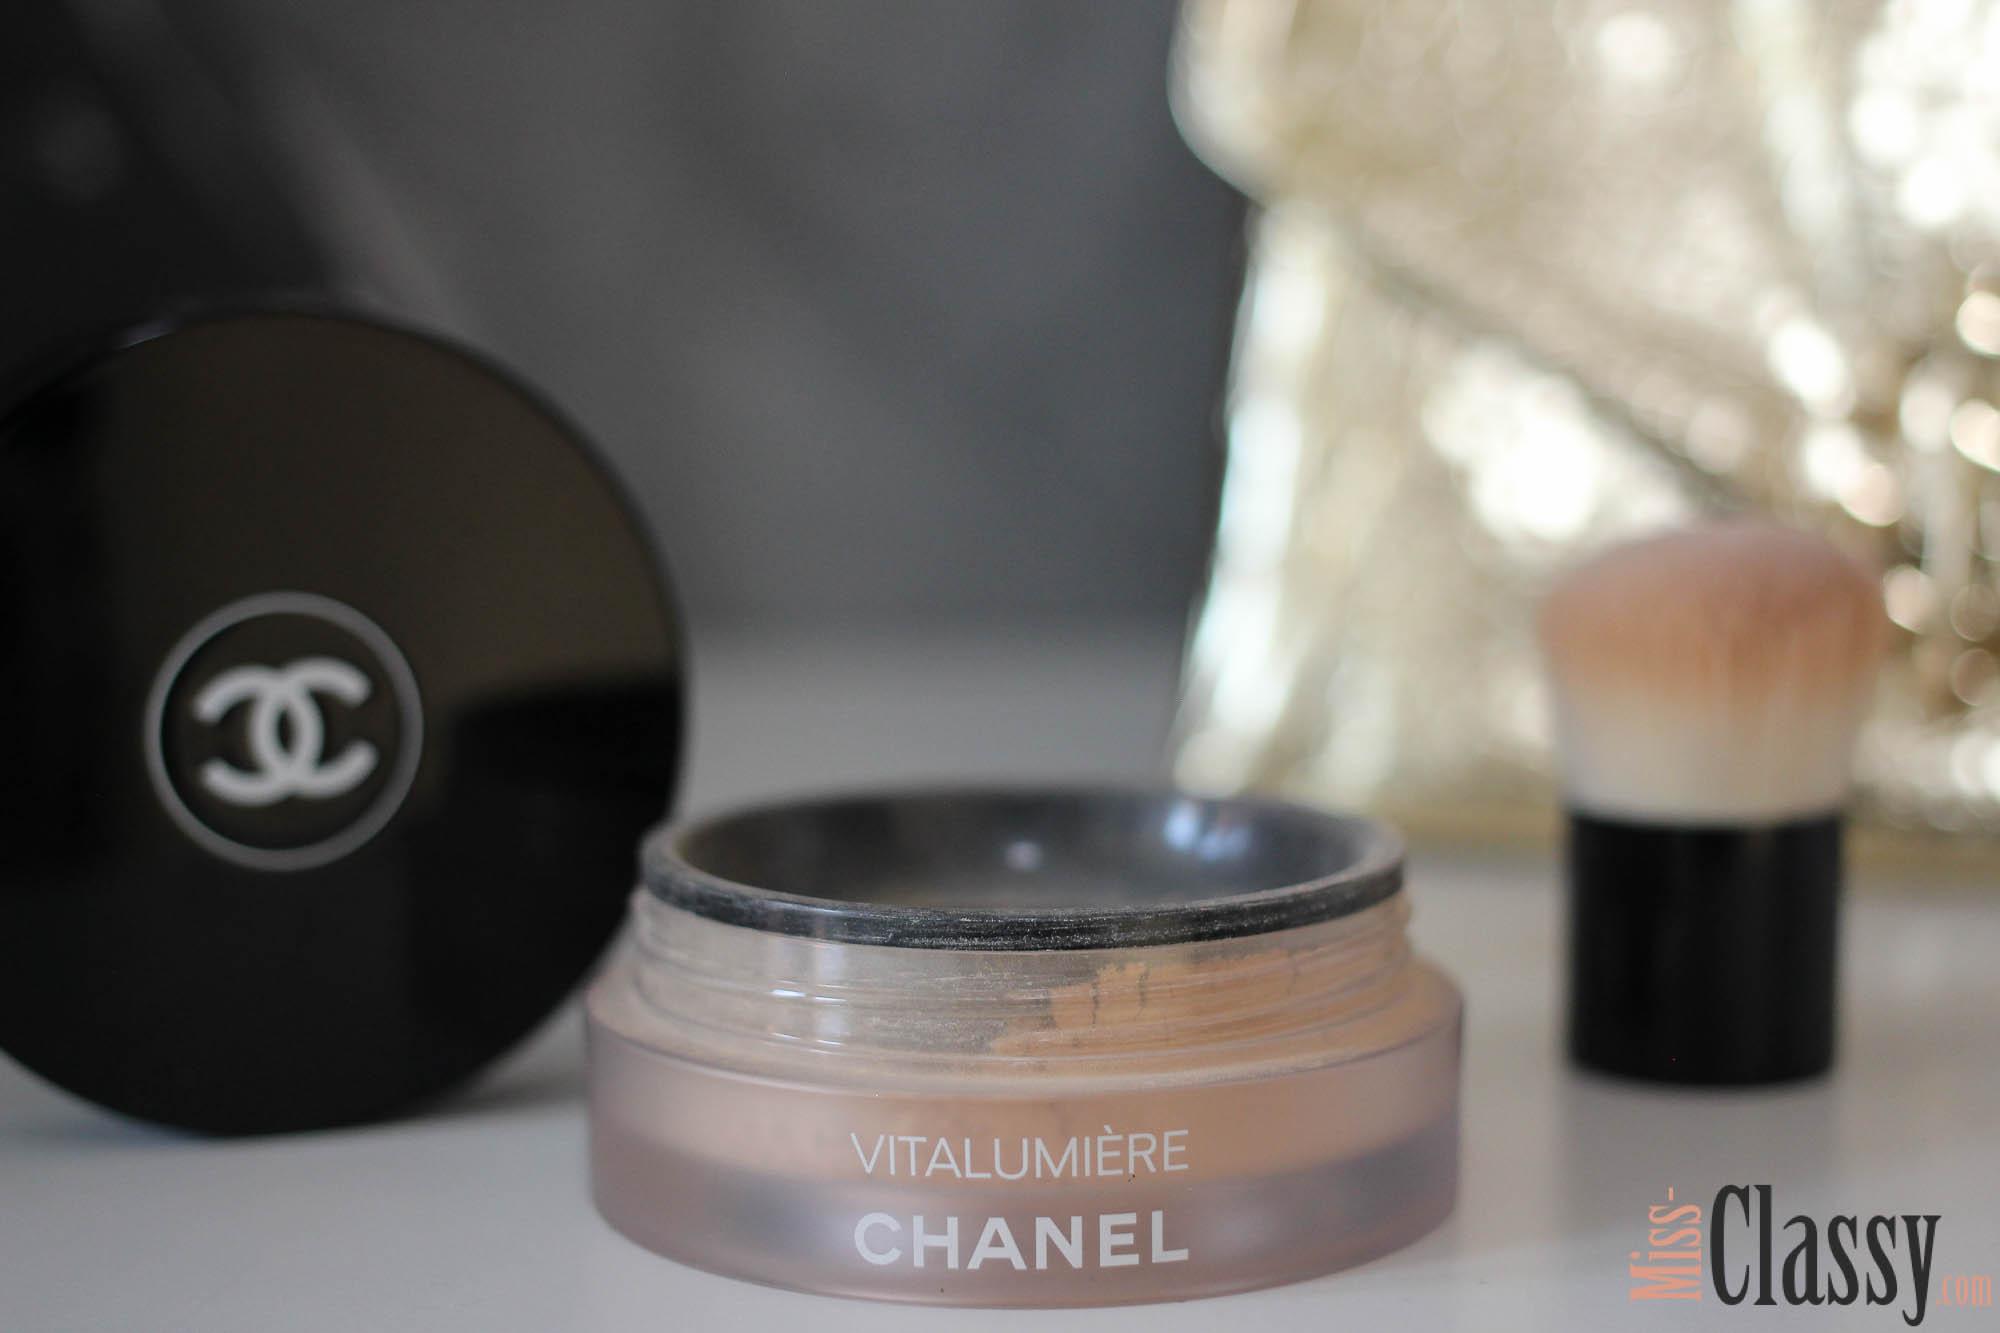 CHANEL - Vitalumiere Loose Powder - Beauty - Cosmetics, Chanel Vitalumiere Loose Powder Erfahrung, Erfahrungsbericht